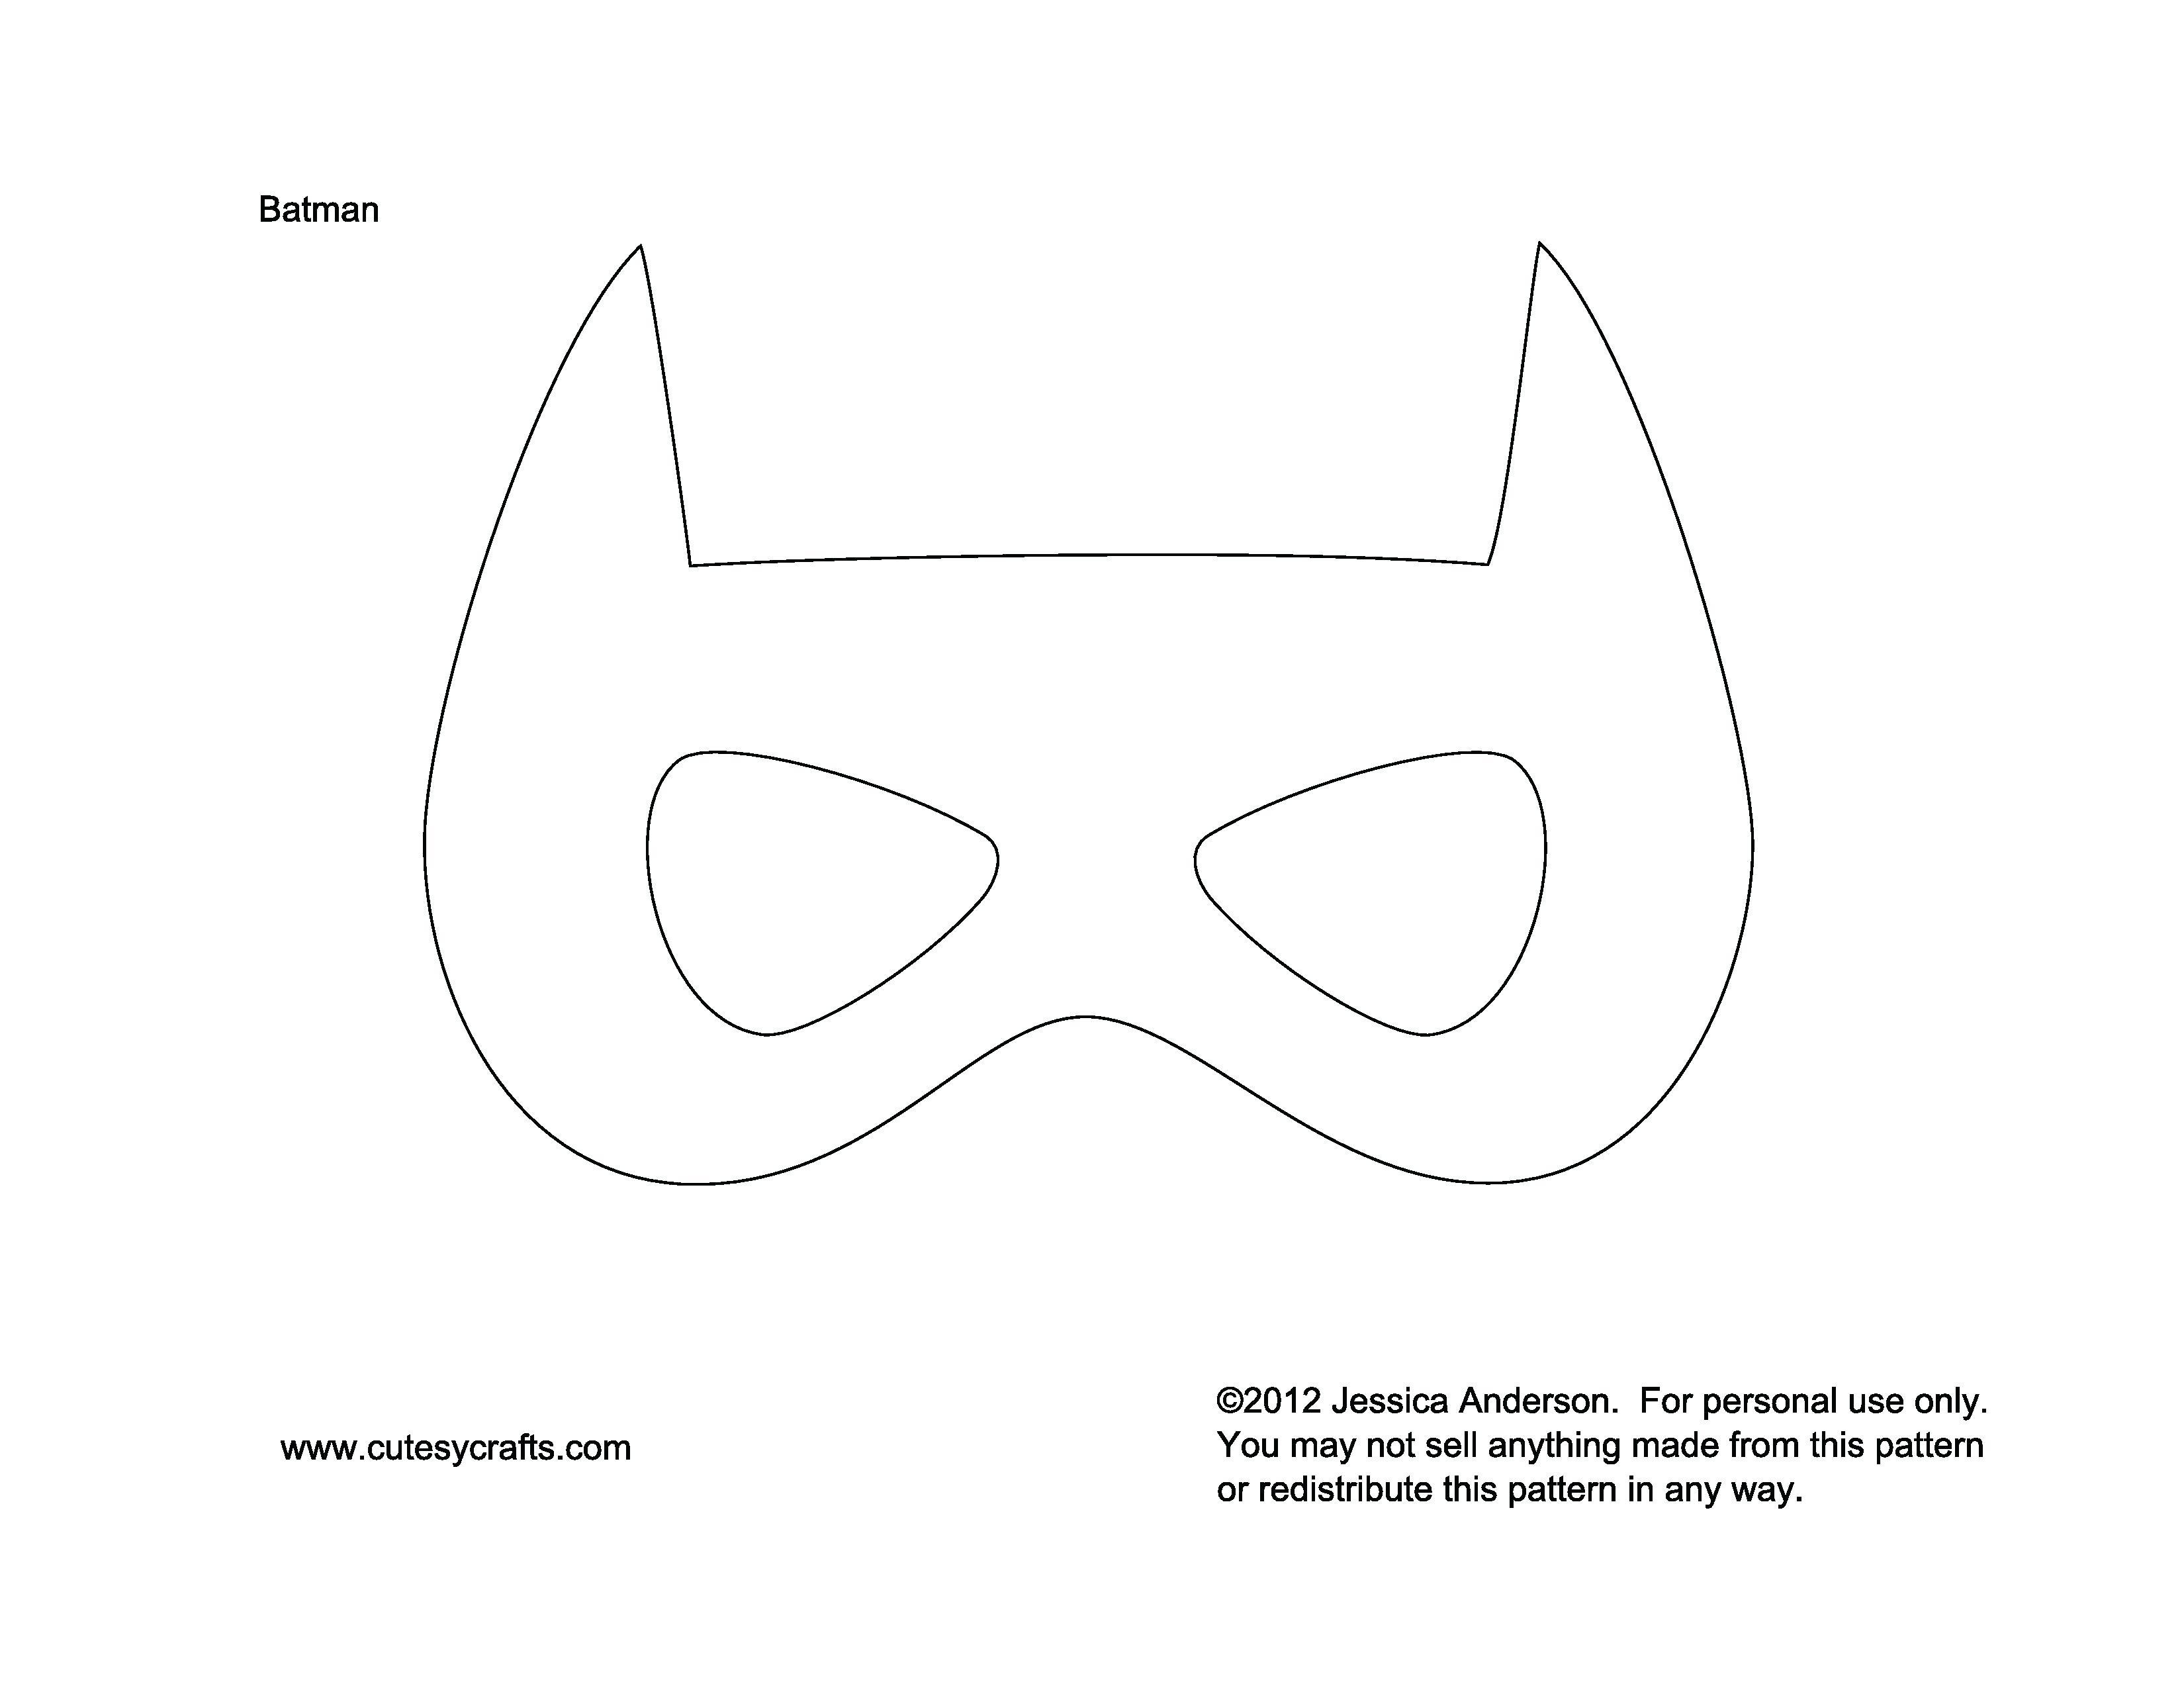 Batman Mask Drawing at GetDrawings.com | Free for personal use ...